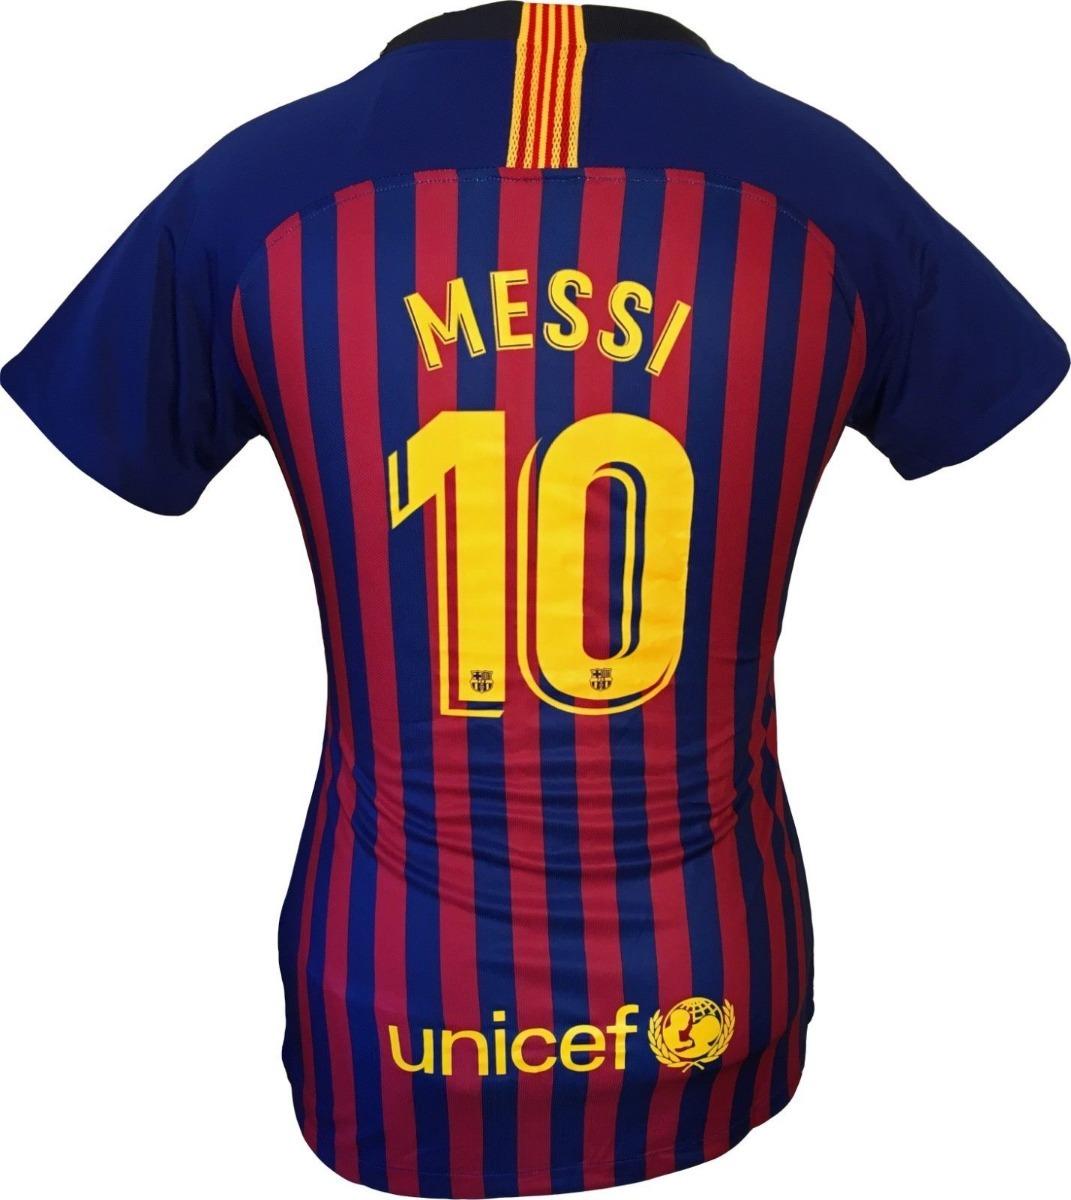 9911e9c6db9f1 camiseta barcelona f.c 2018 2019 messi 10 para mujer oficial. Cargando zoom.